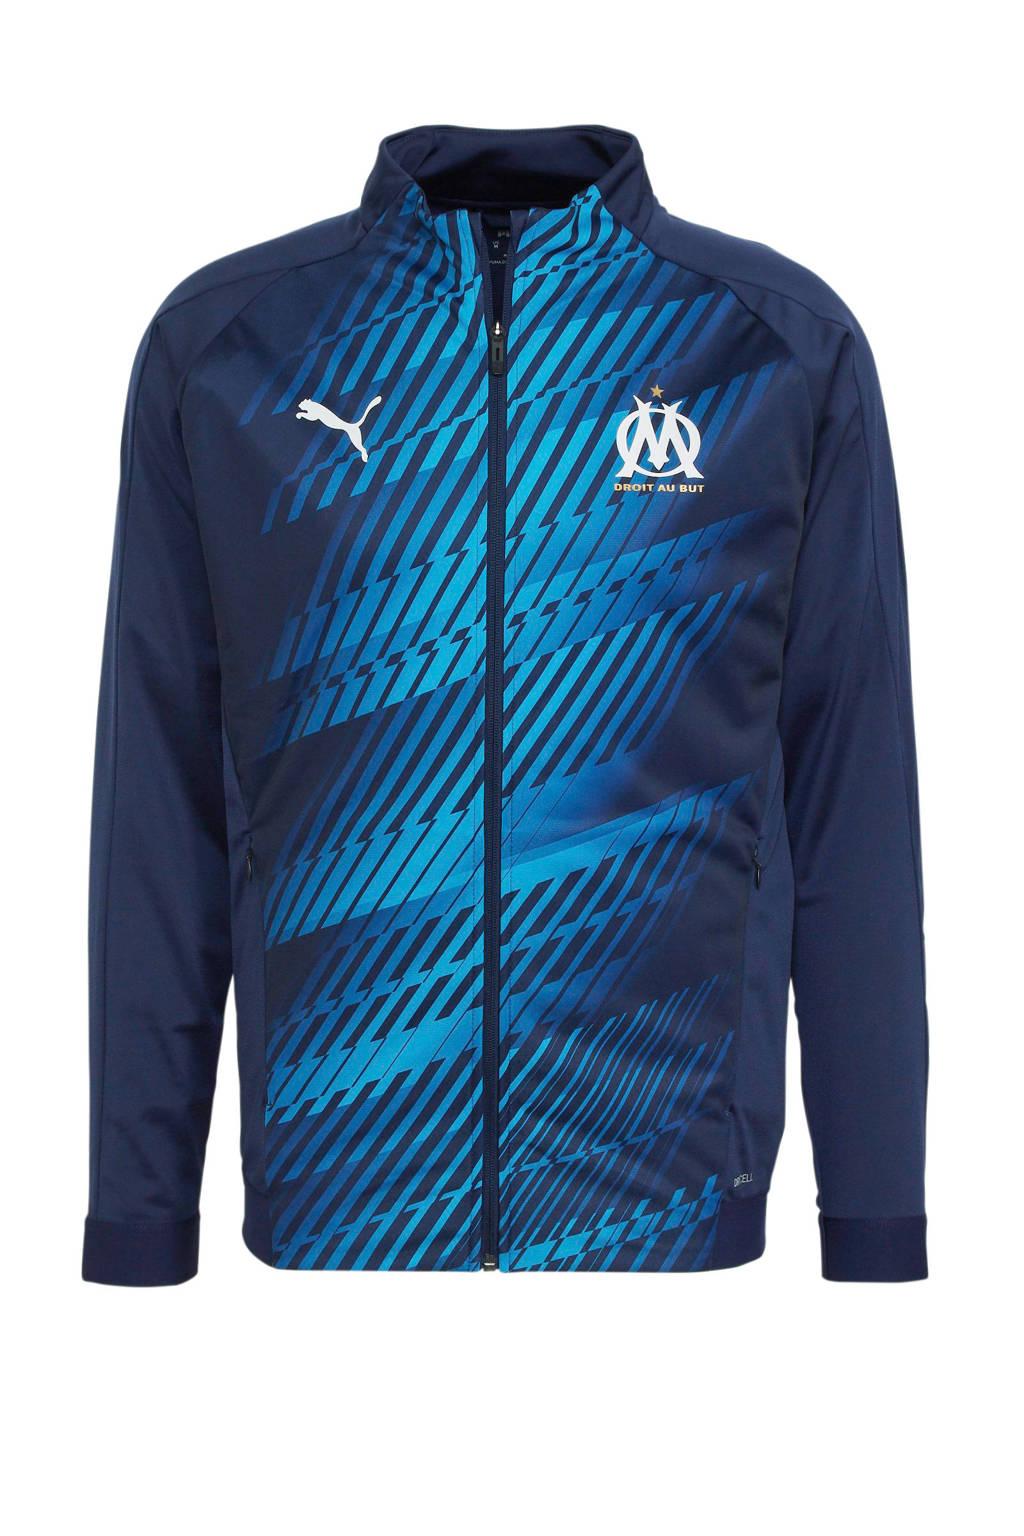 Puma Senior Olympique Marseille voetbaljack donkerblauw, Donkerblauw/blauw